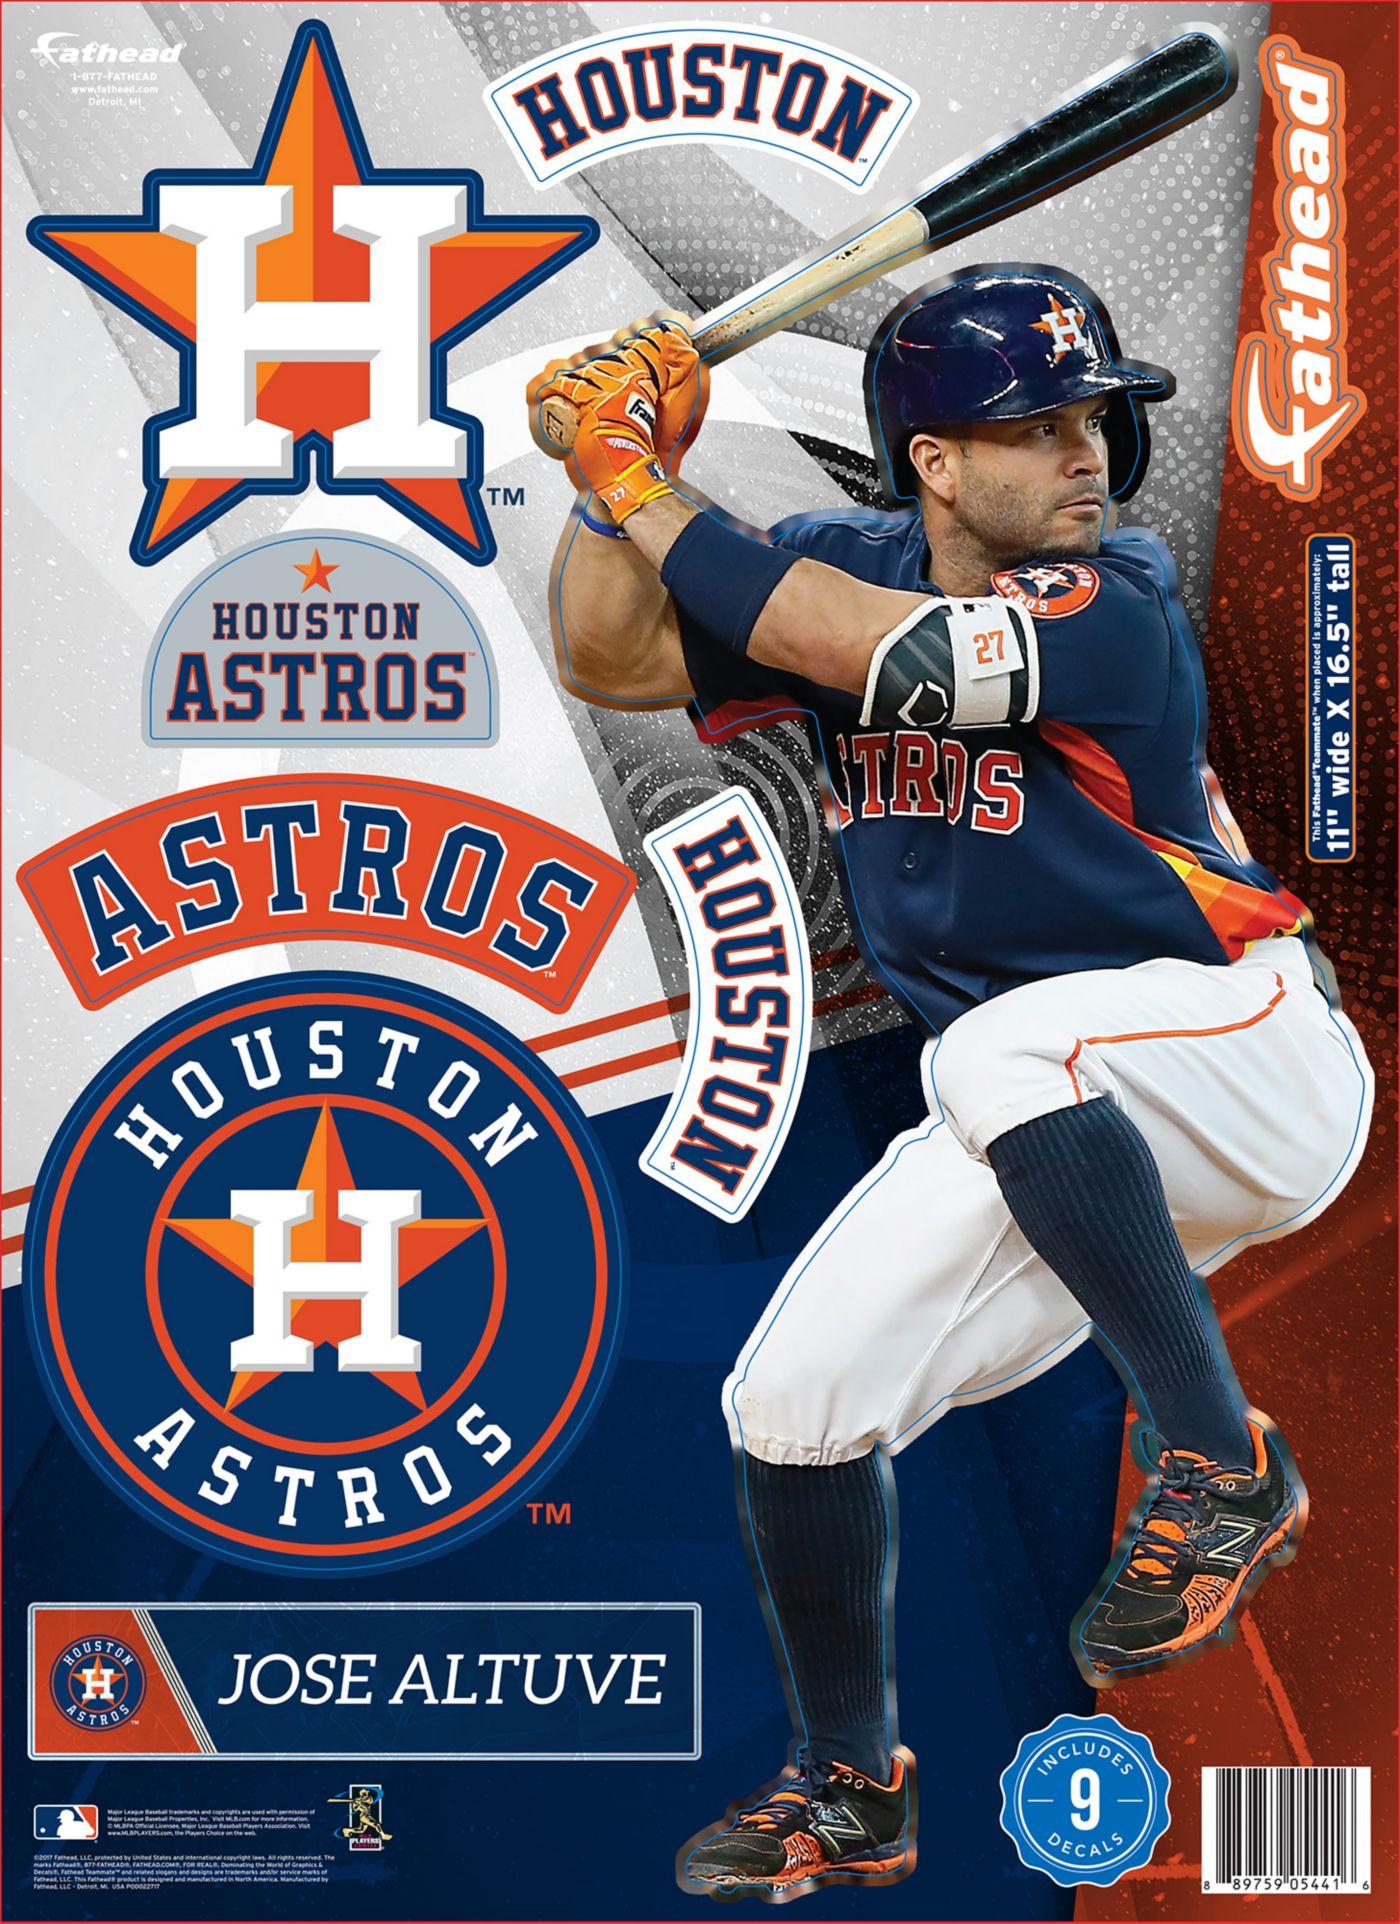 Fathead Houston Astros José Altuve Wall Decal